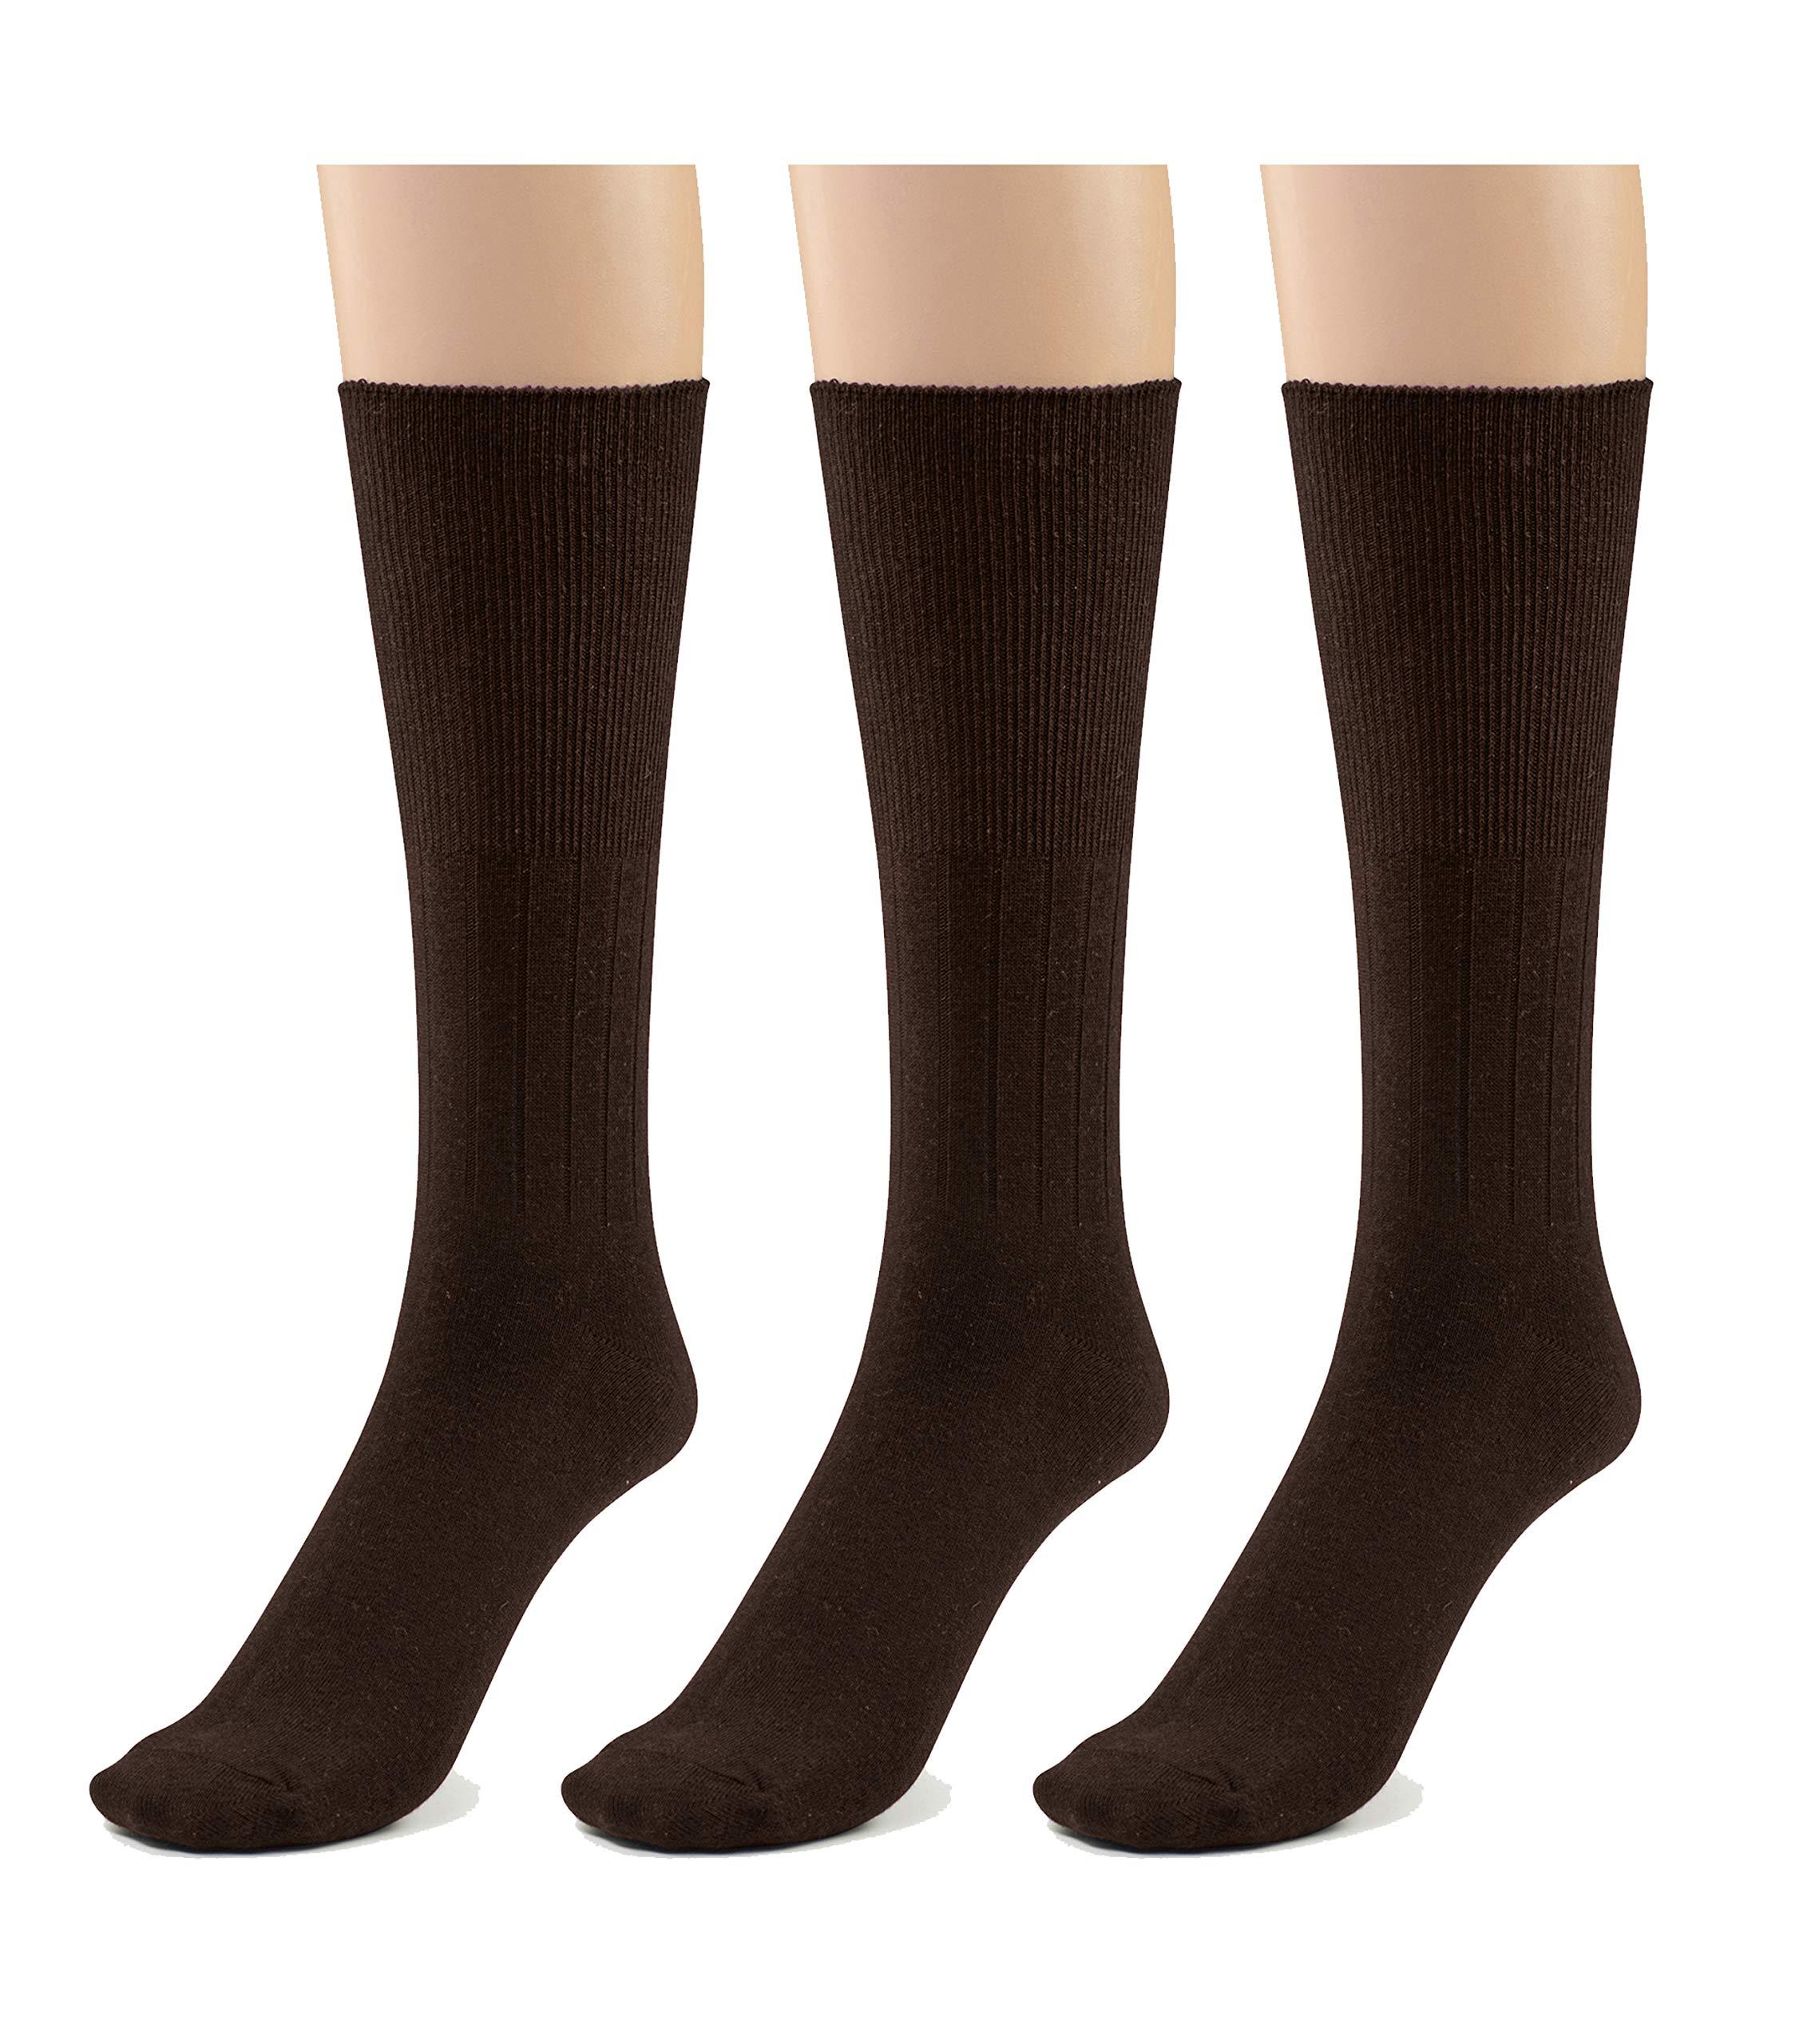 c4f82aeaa53 Silky Toes 3 or 6 Pack Women s Diabetic Premium Soft Non-Binding Cotton  Dress Socks